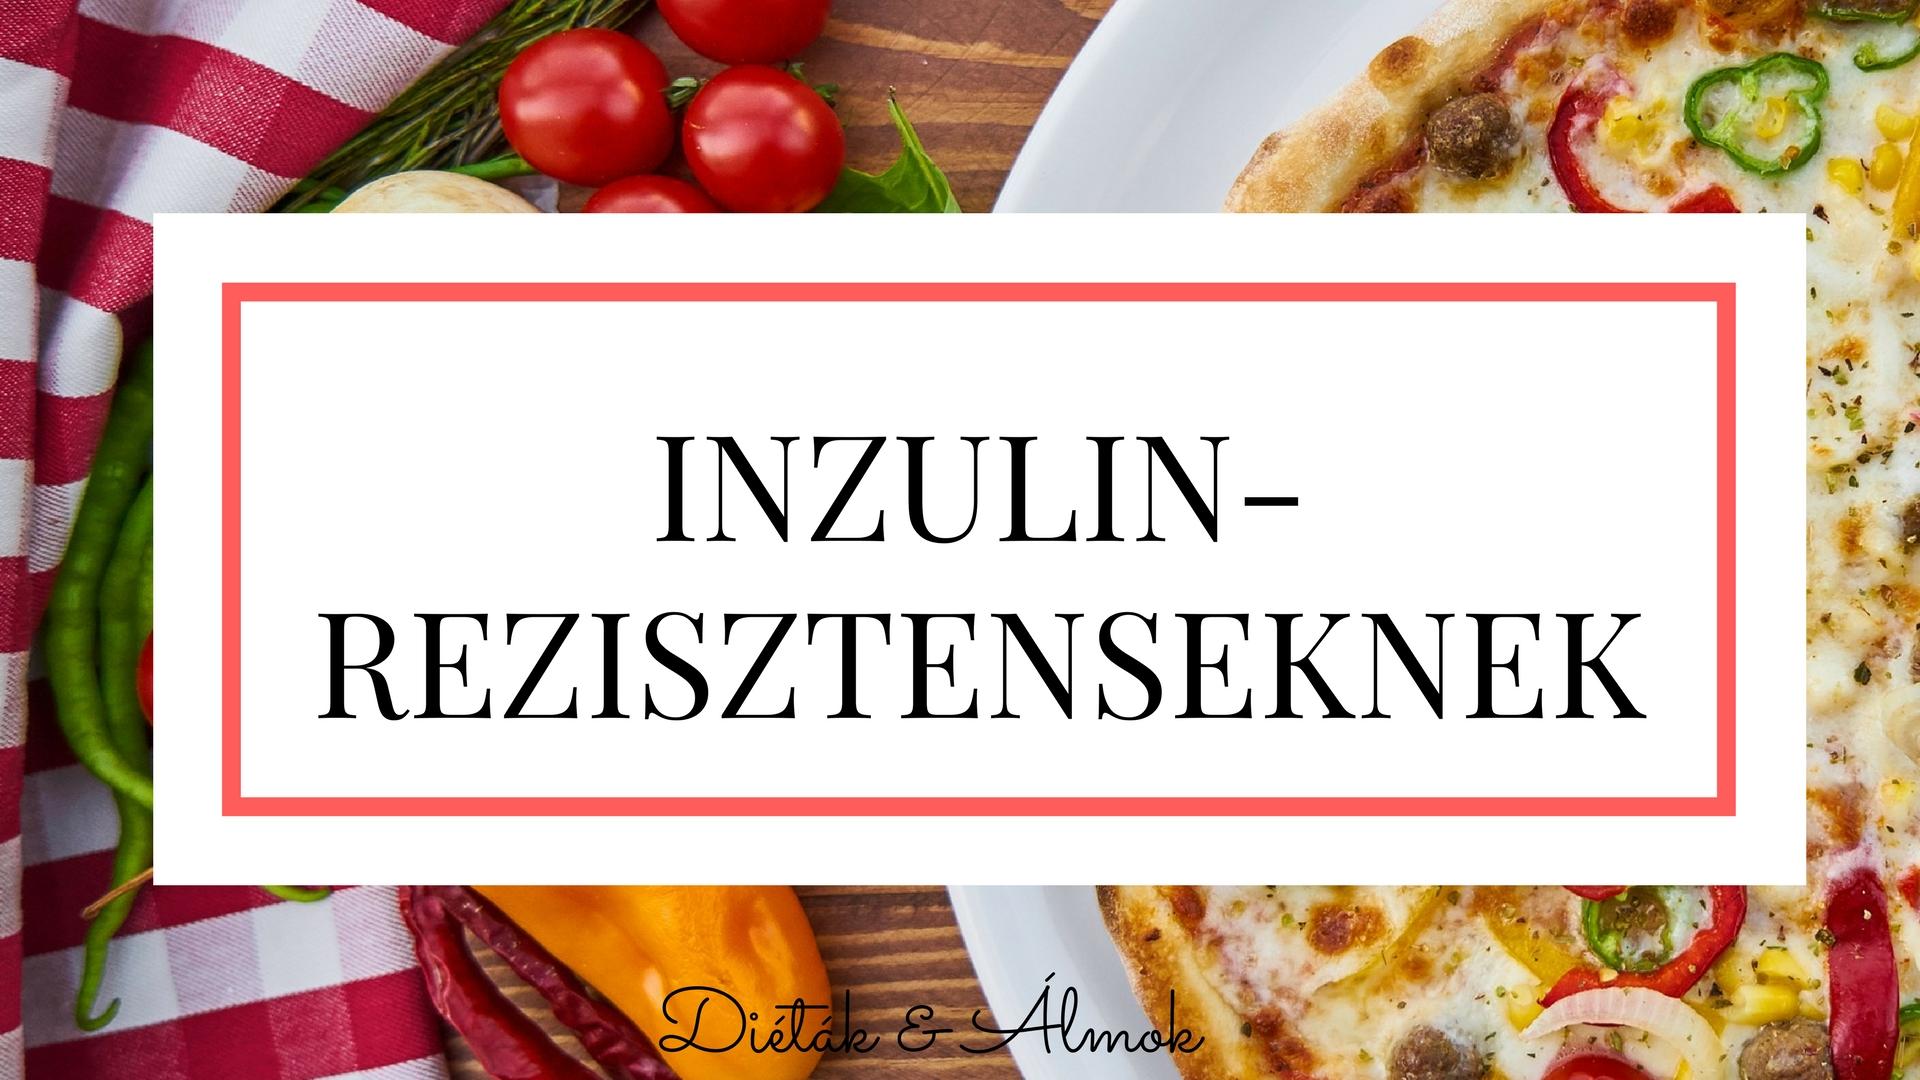 dietak_almok_-szenhidrat_dieta_inzulin-rezisztencia_blog.jpg